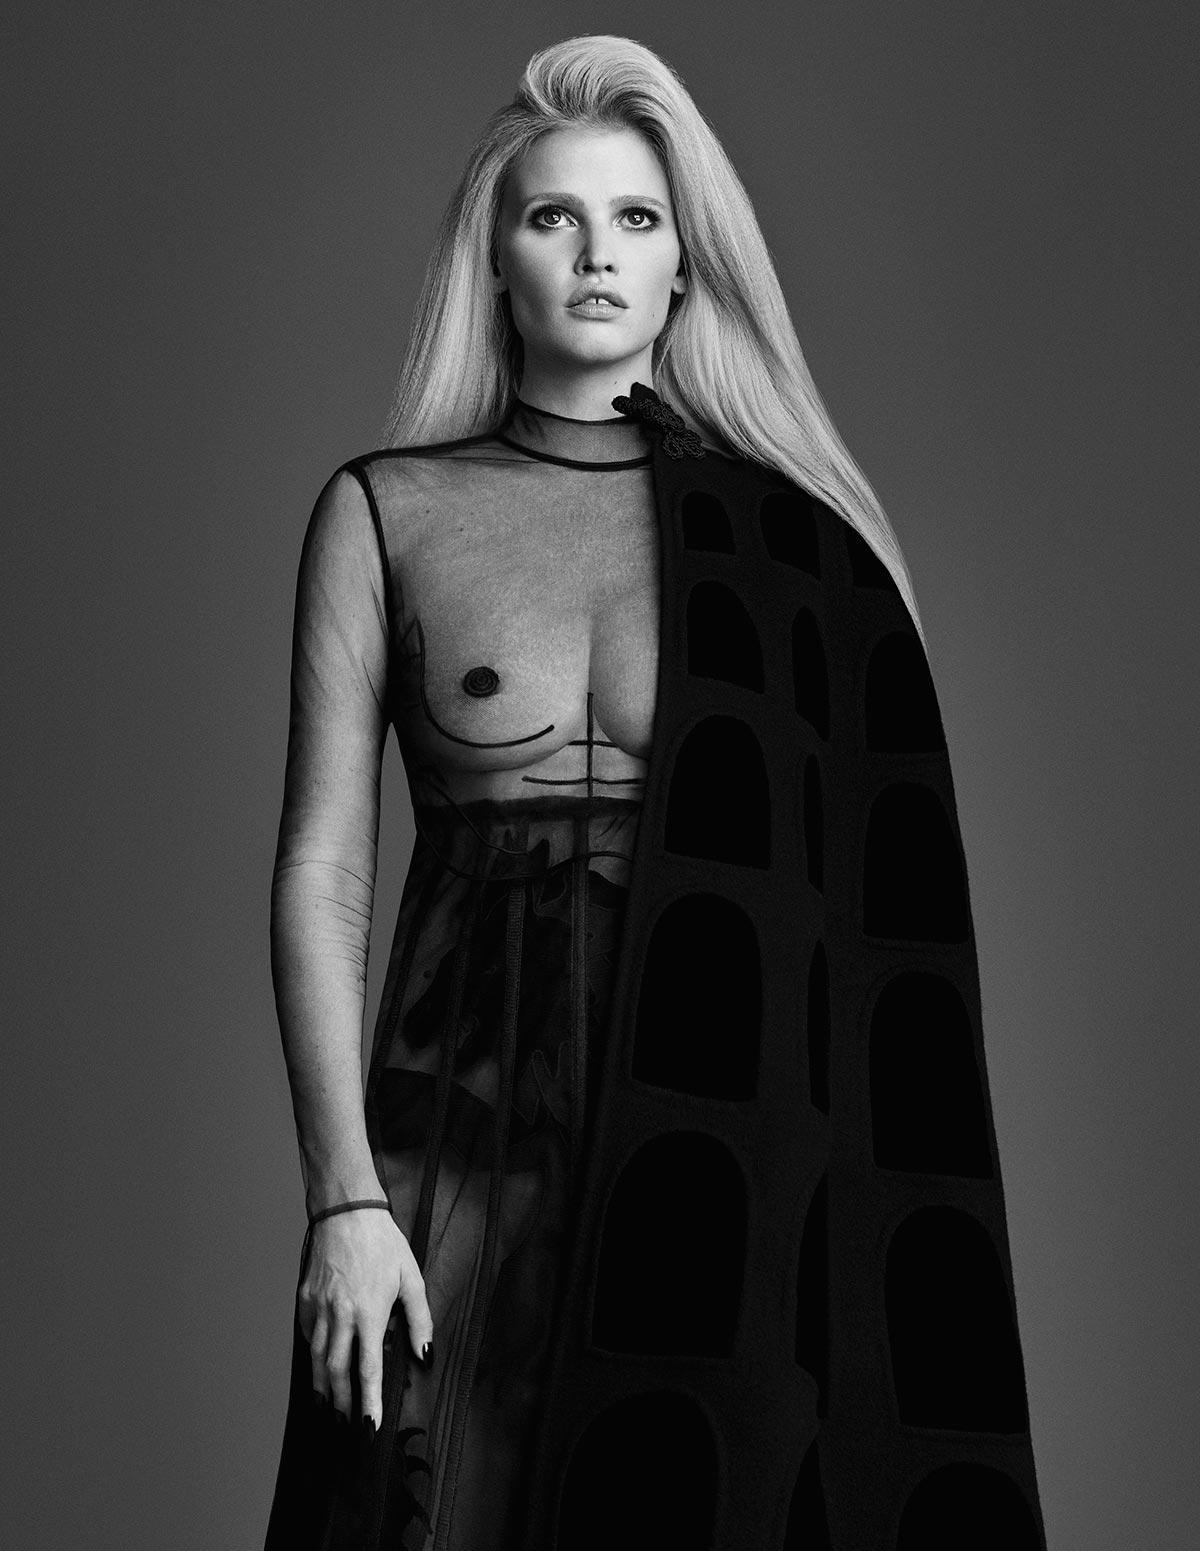 Lara Stone topless photos (3)